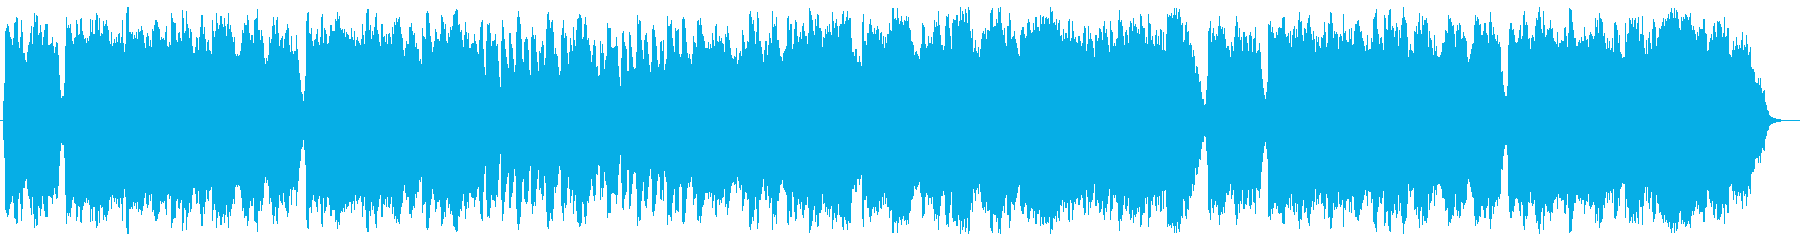 Wedding Chorus (Wagner)'s reproduced waveform